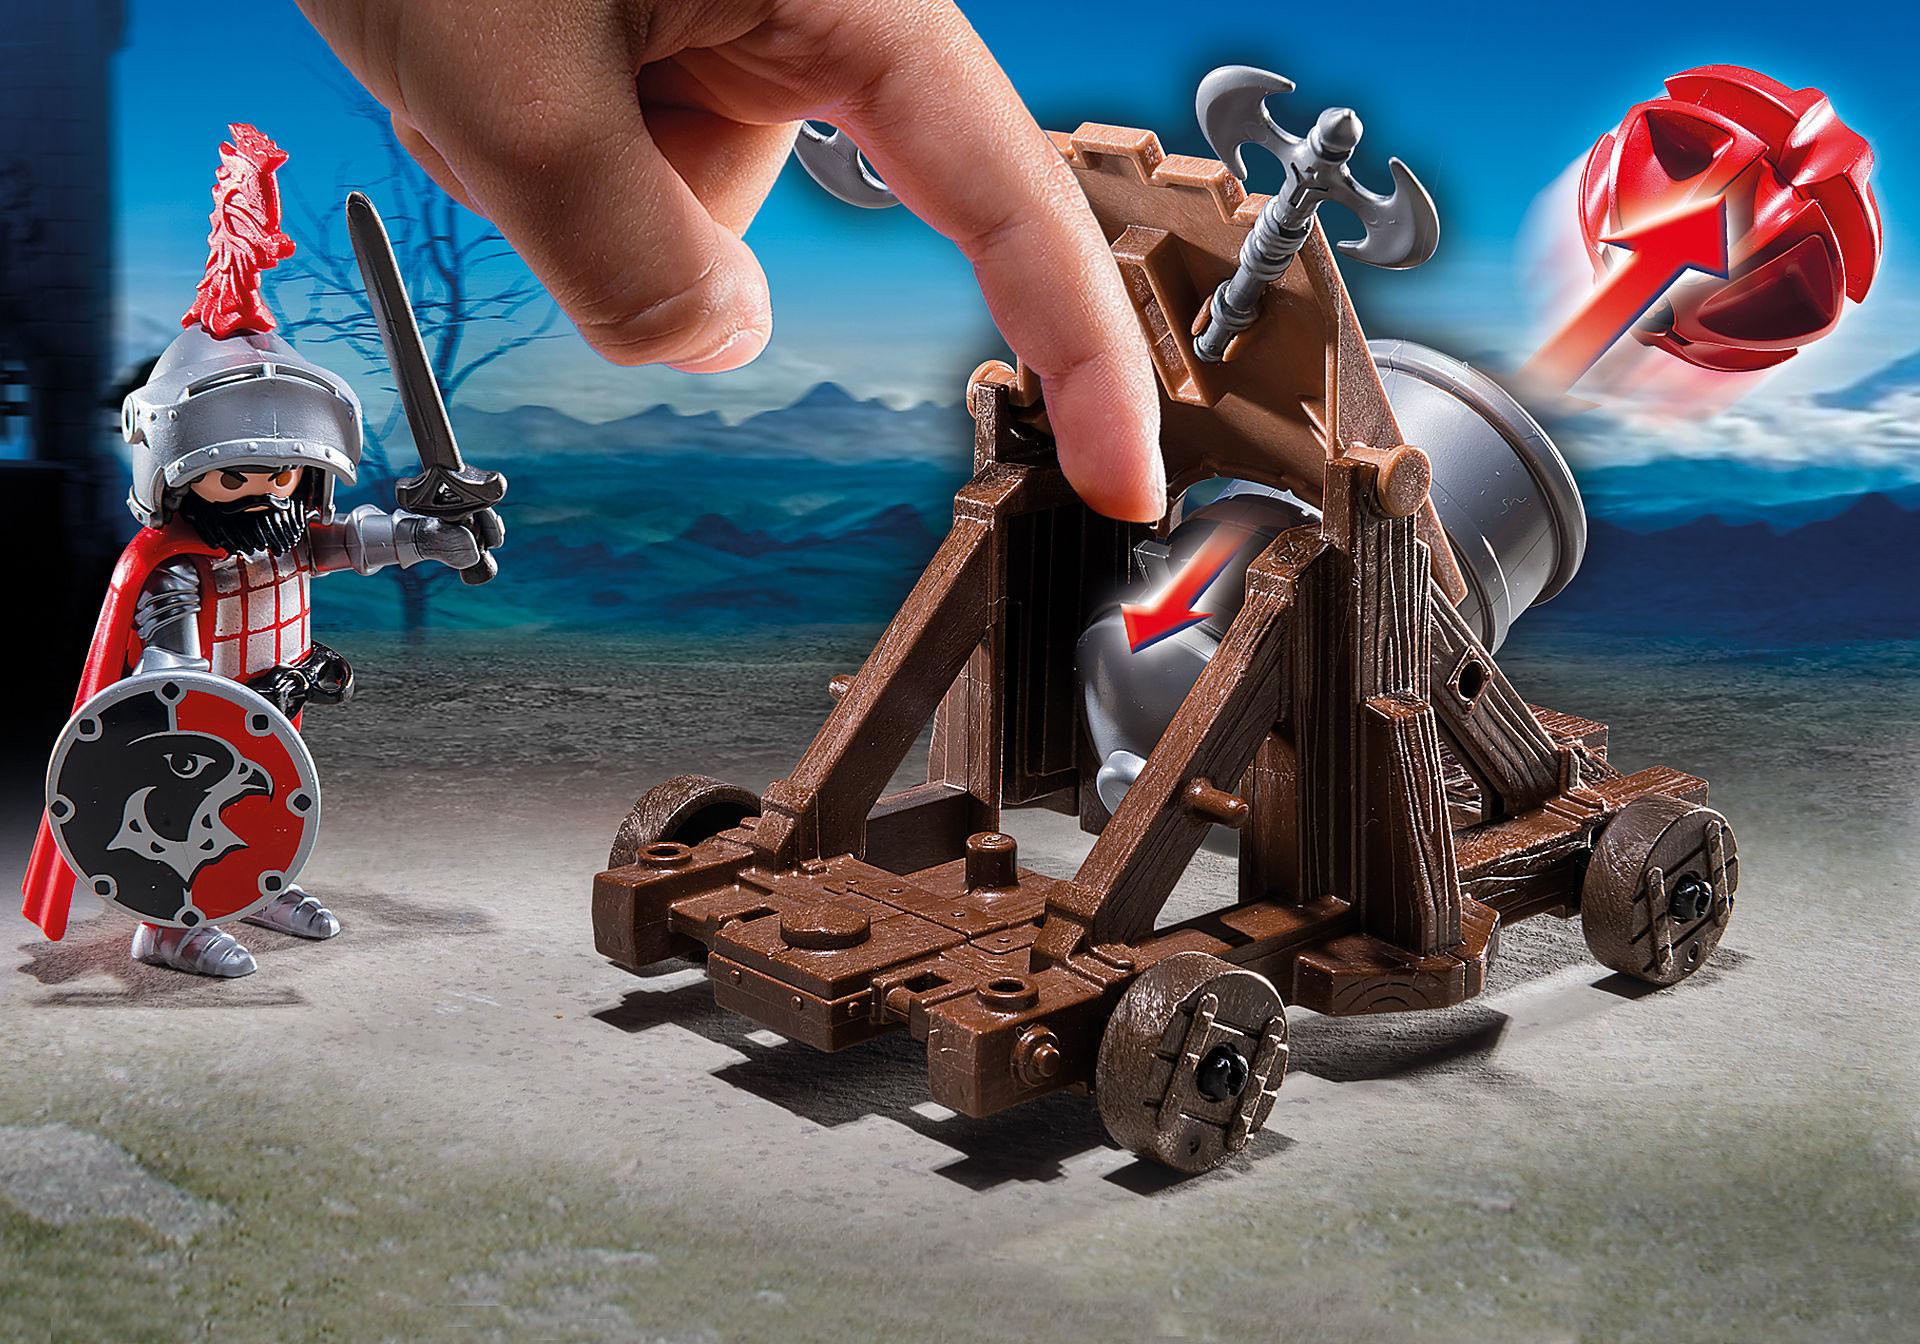 http://media.playmobil.com/i/playmobil/6038_product_extra2/Hawk Knights` Battle Cannon